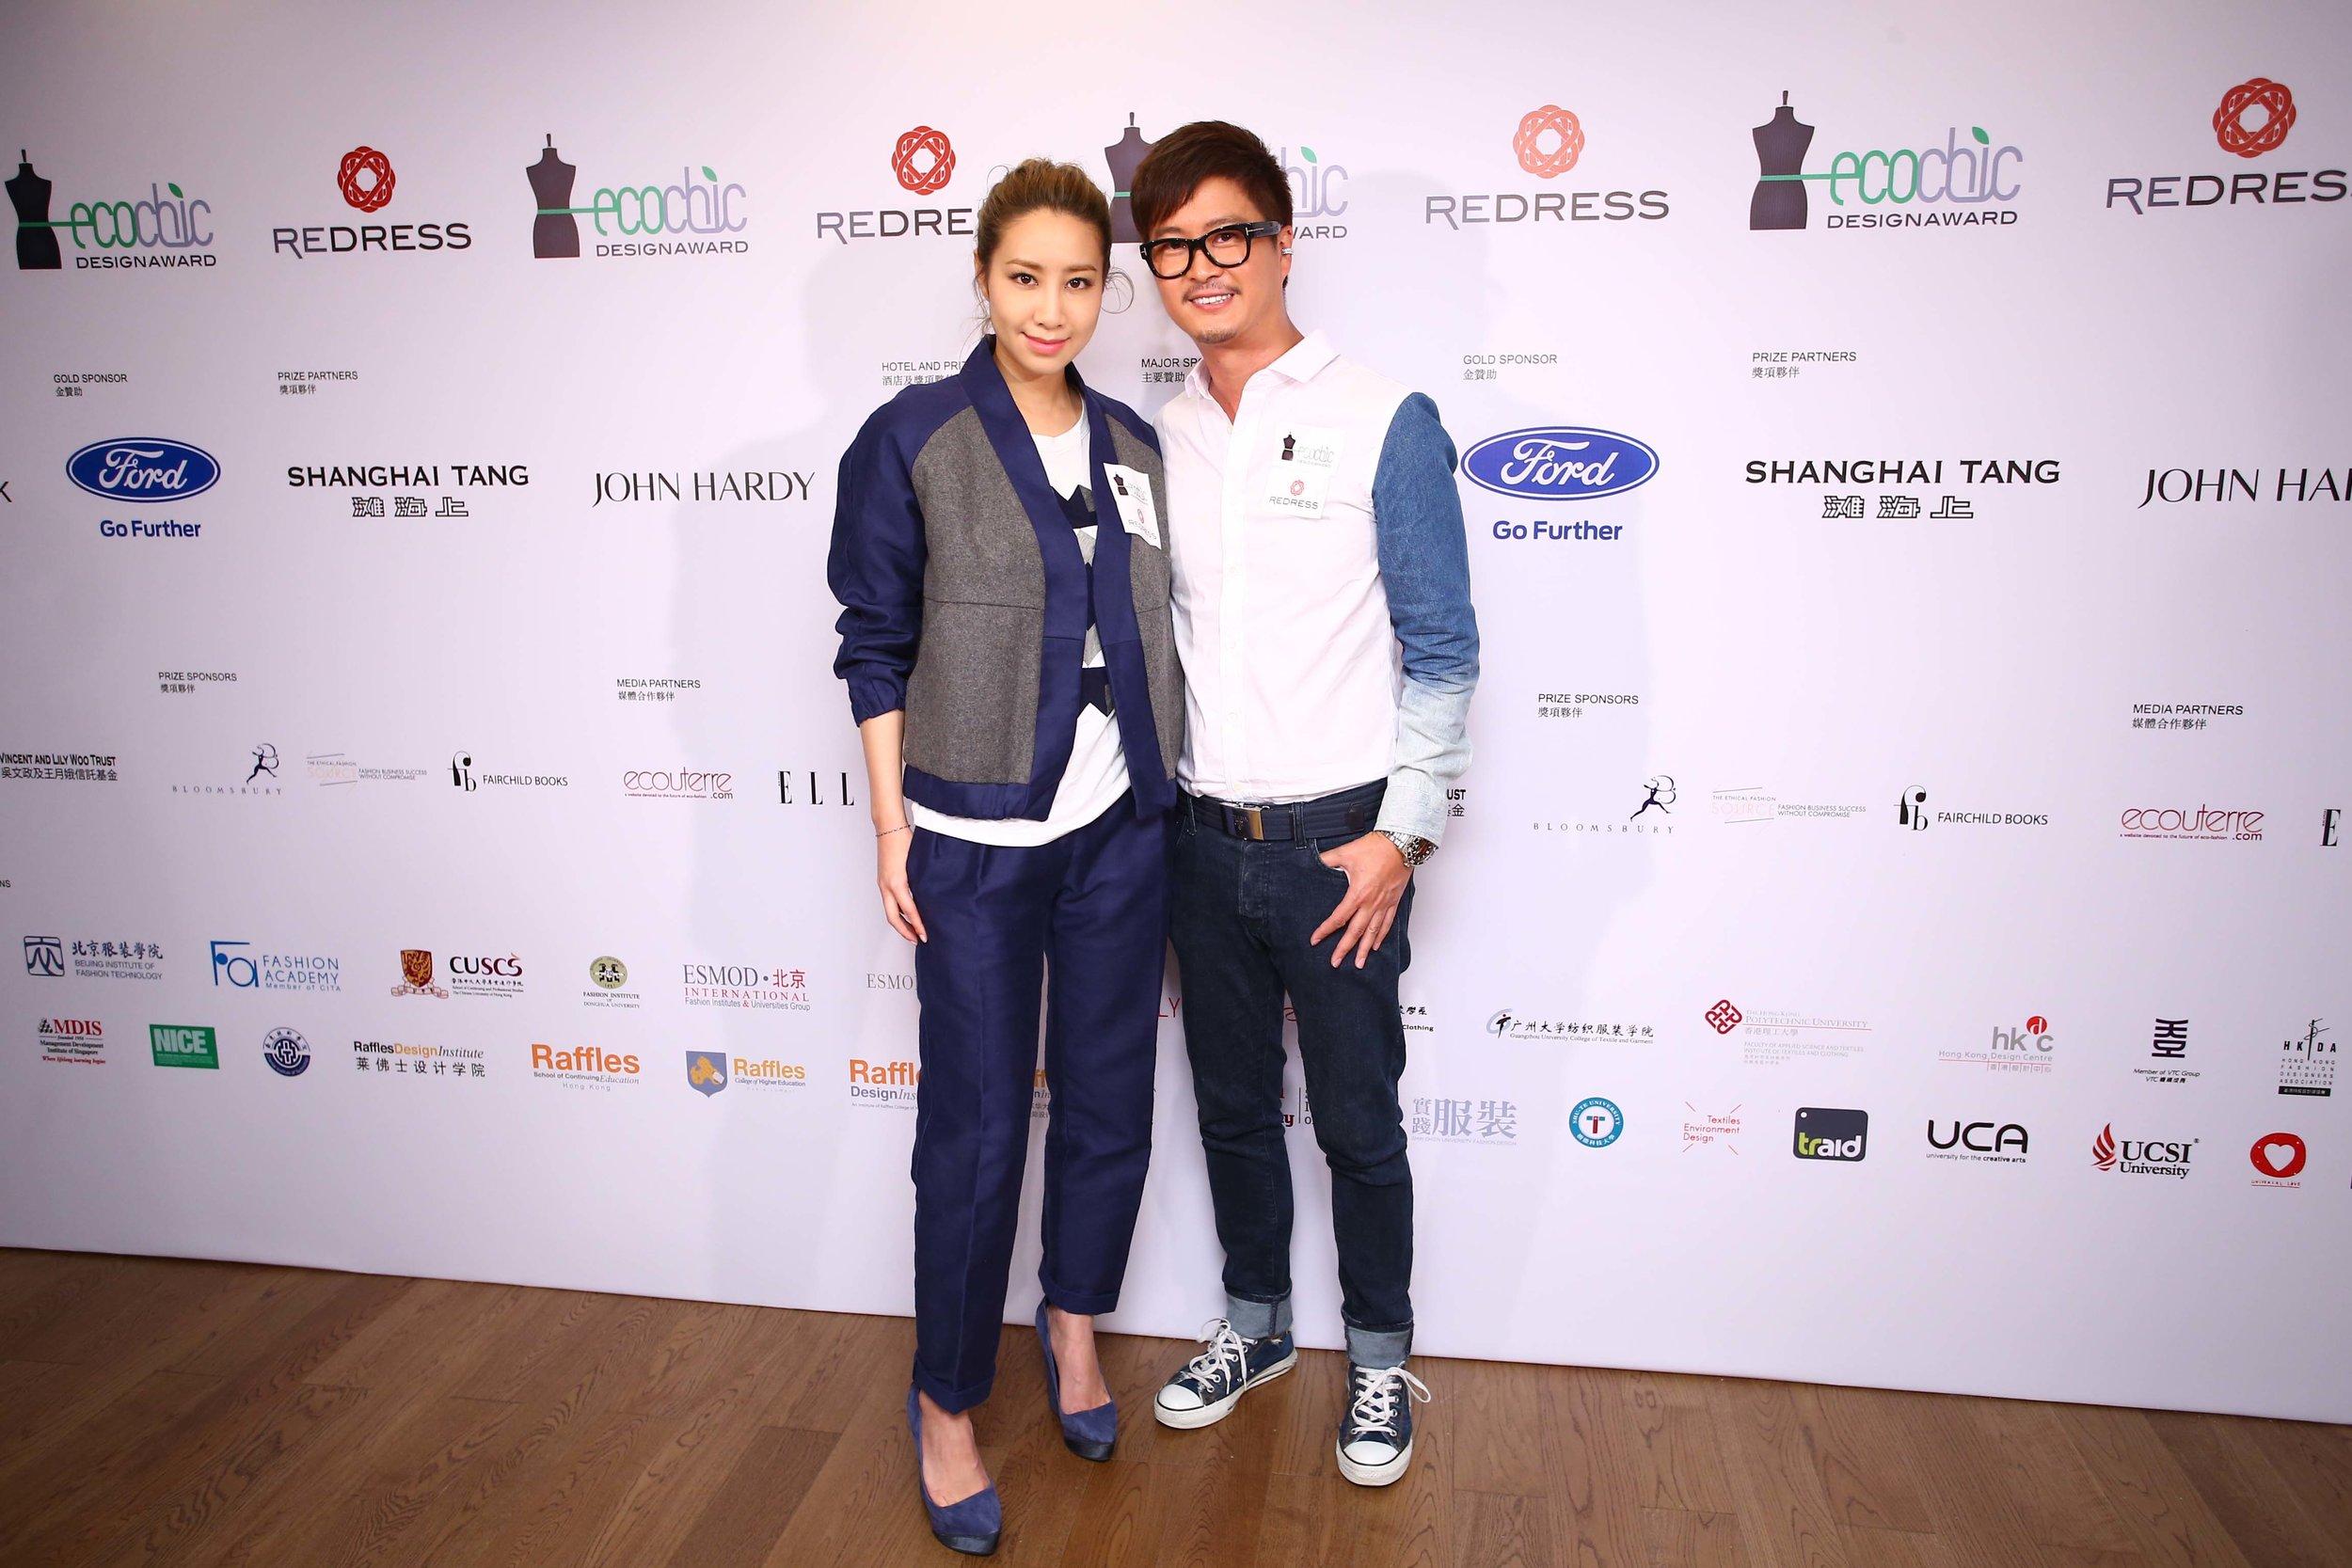 Hong Kong singer Kary Ng and Hong Kong designer Dorian Ho attend the Redress Design Award 2015/16 Hong Kong launch event